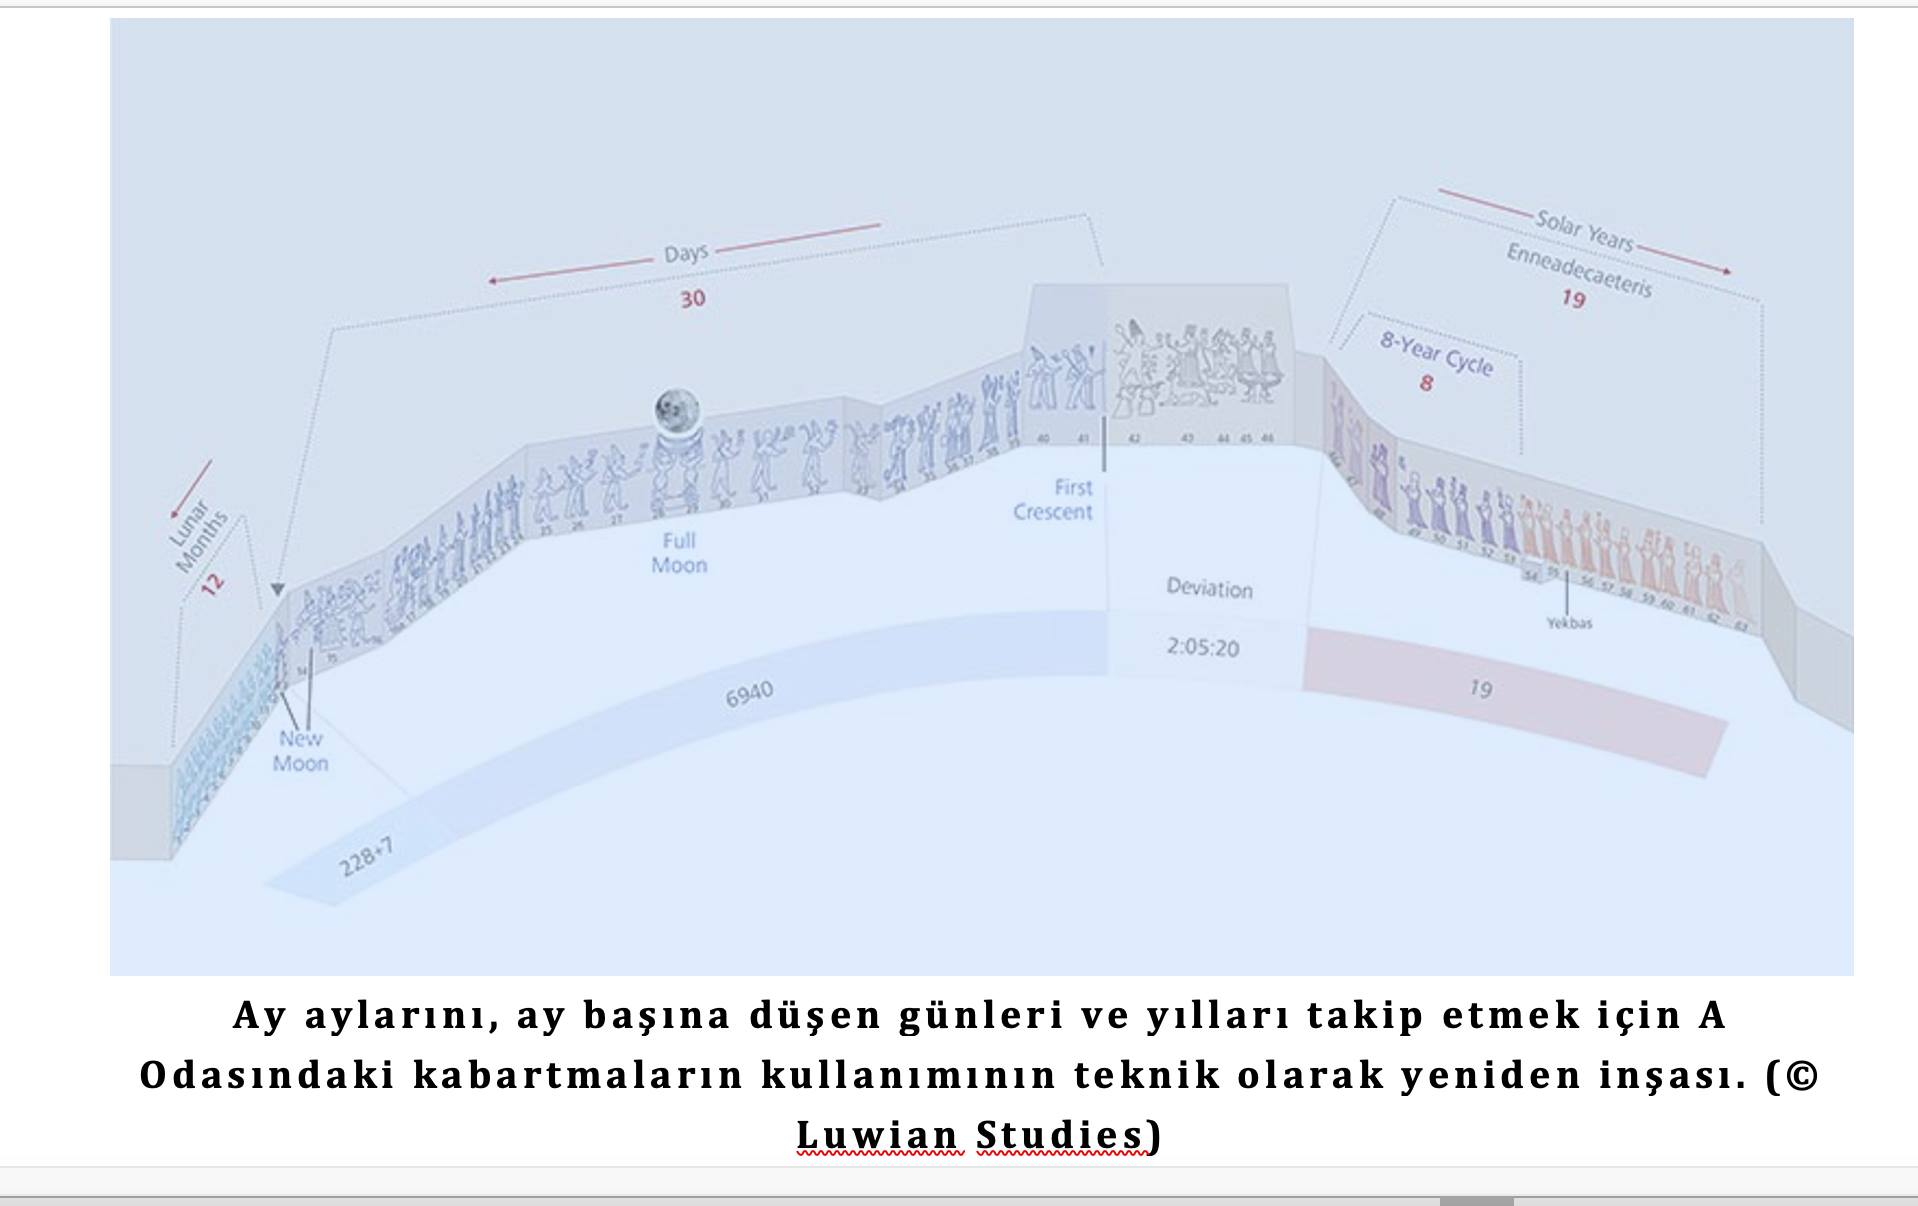 6 DAB Alevi Bektasi kızılbas Cem semah eski takvim çorum hitit